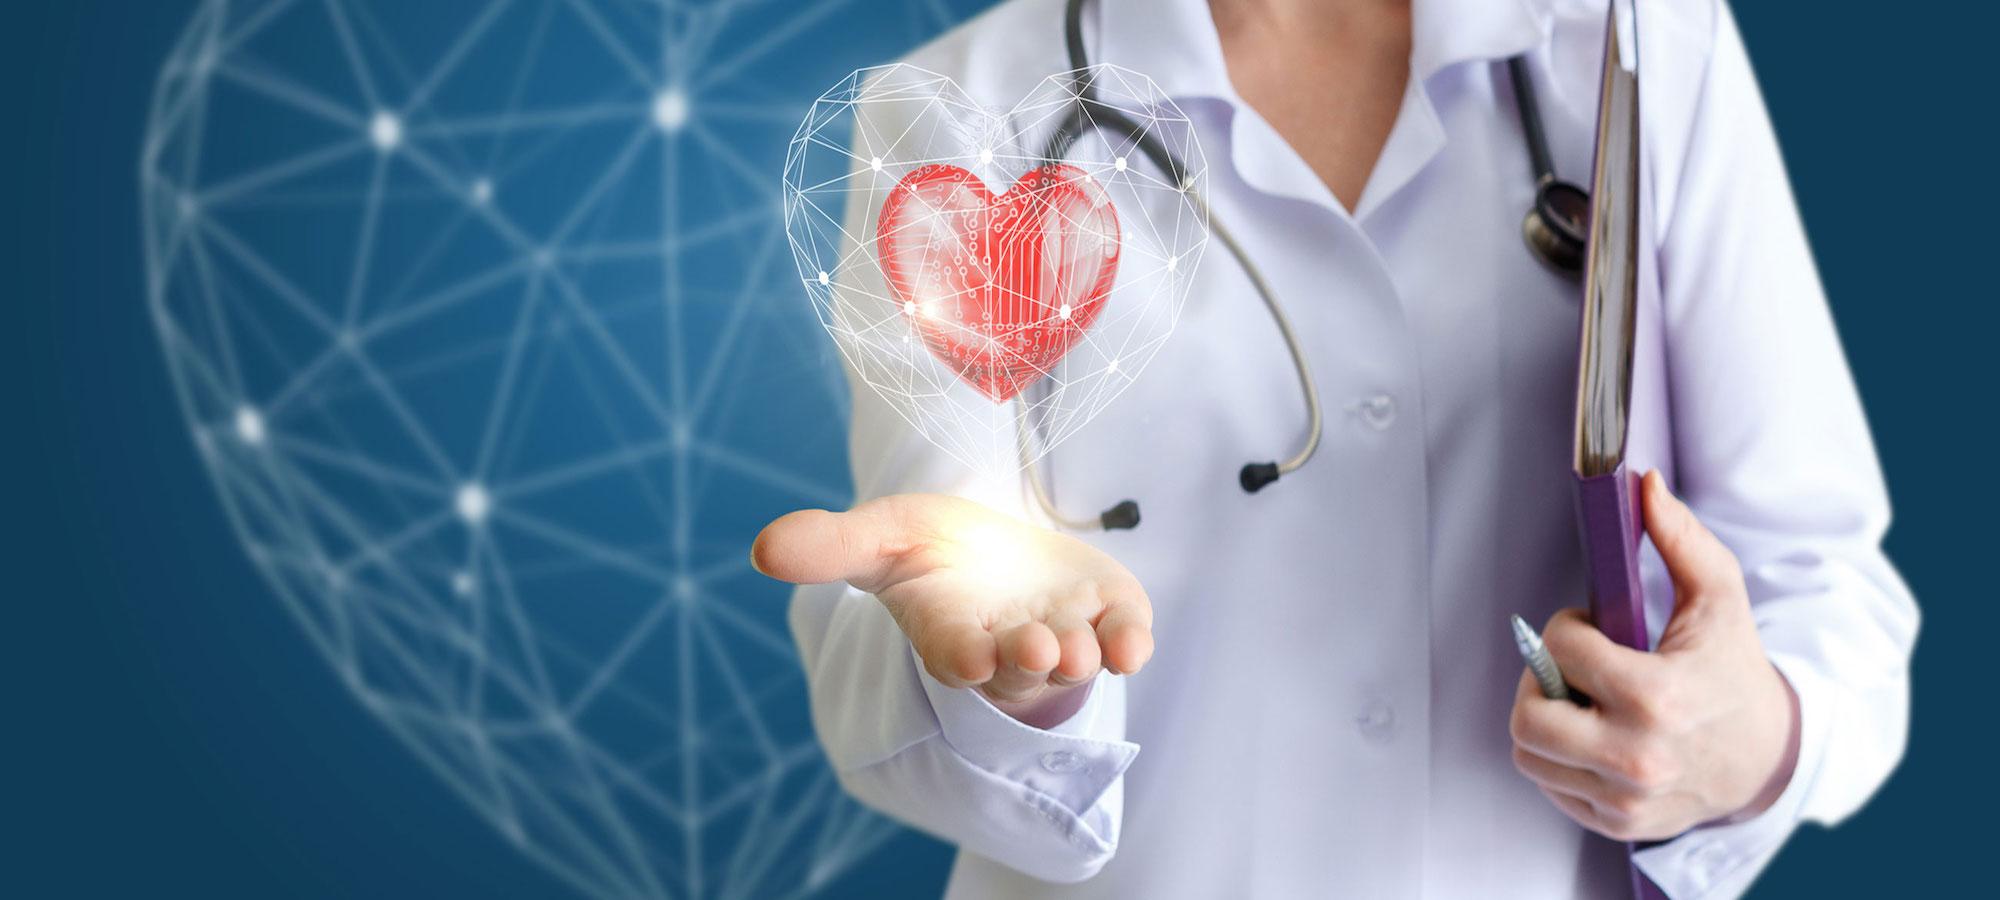 Dr. Padgaonkar's Heart Clinic